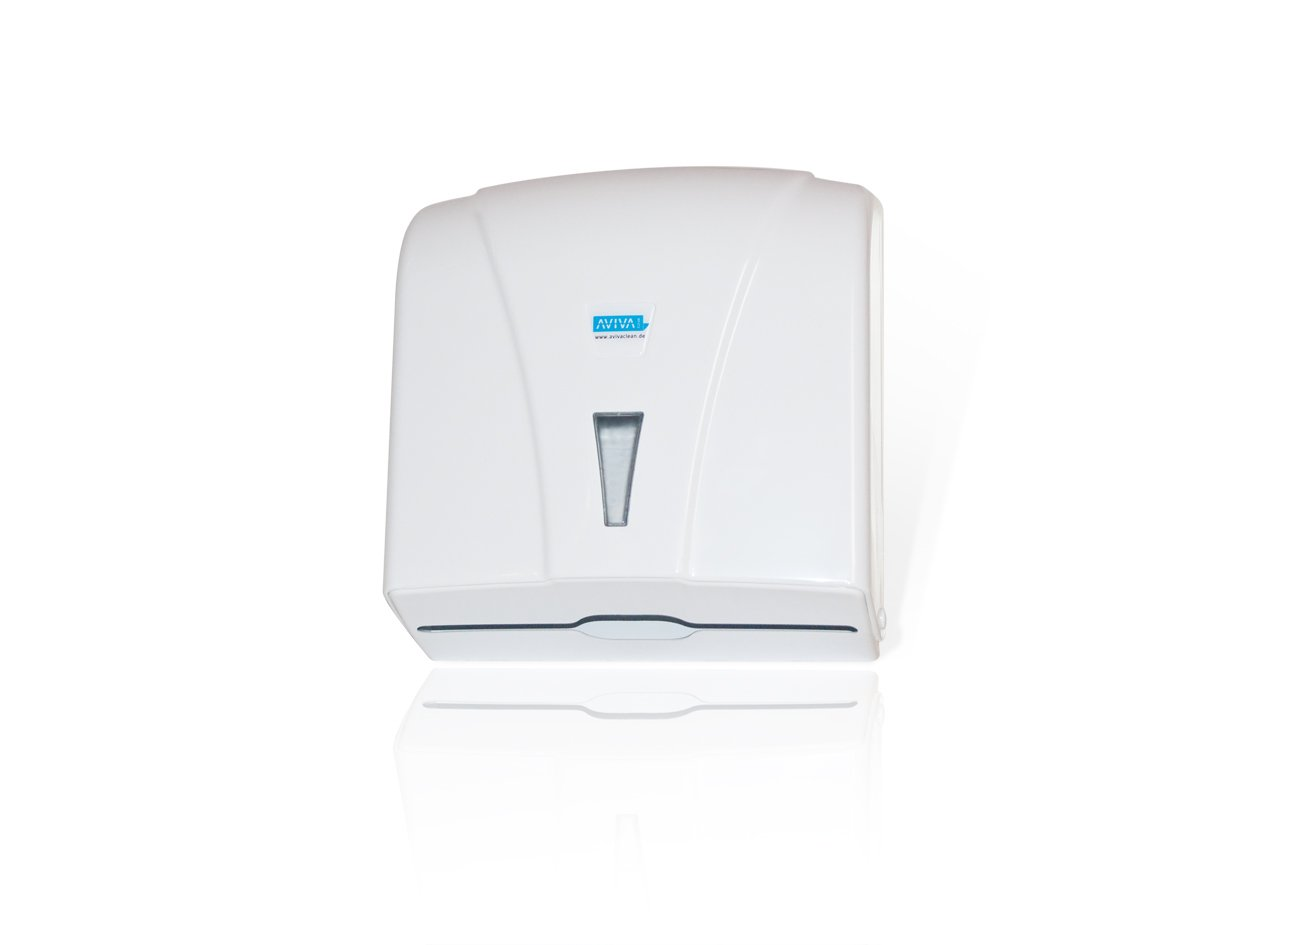 Papierspender Aviva Clean Papierhandtuchspender Papierhandtuchspender in wei/ß geeignet f/ür Krankenh/äuser Praxen etc. Kunststoffspender